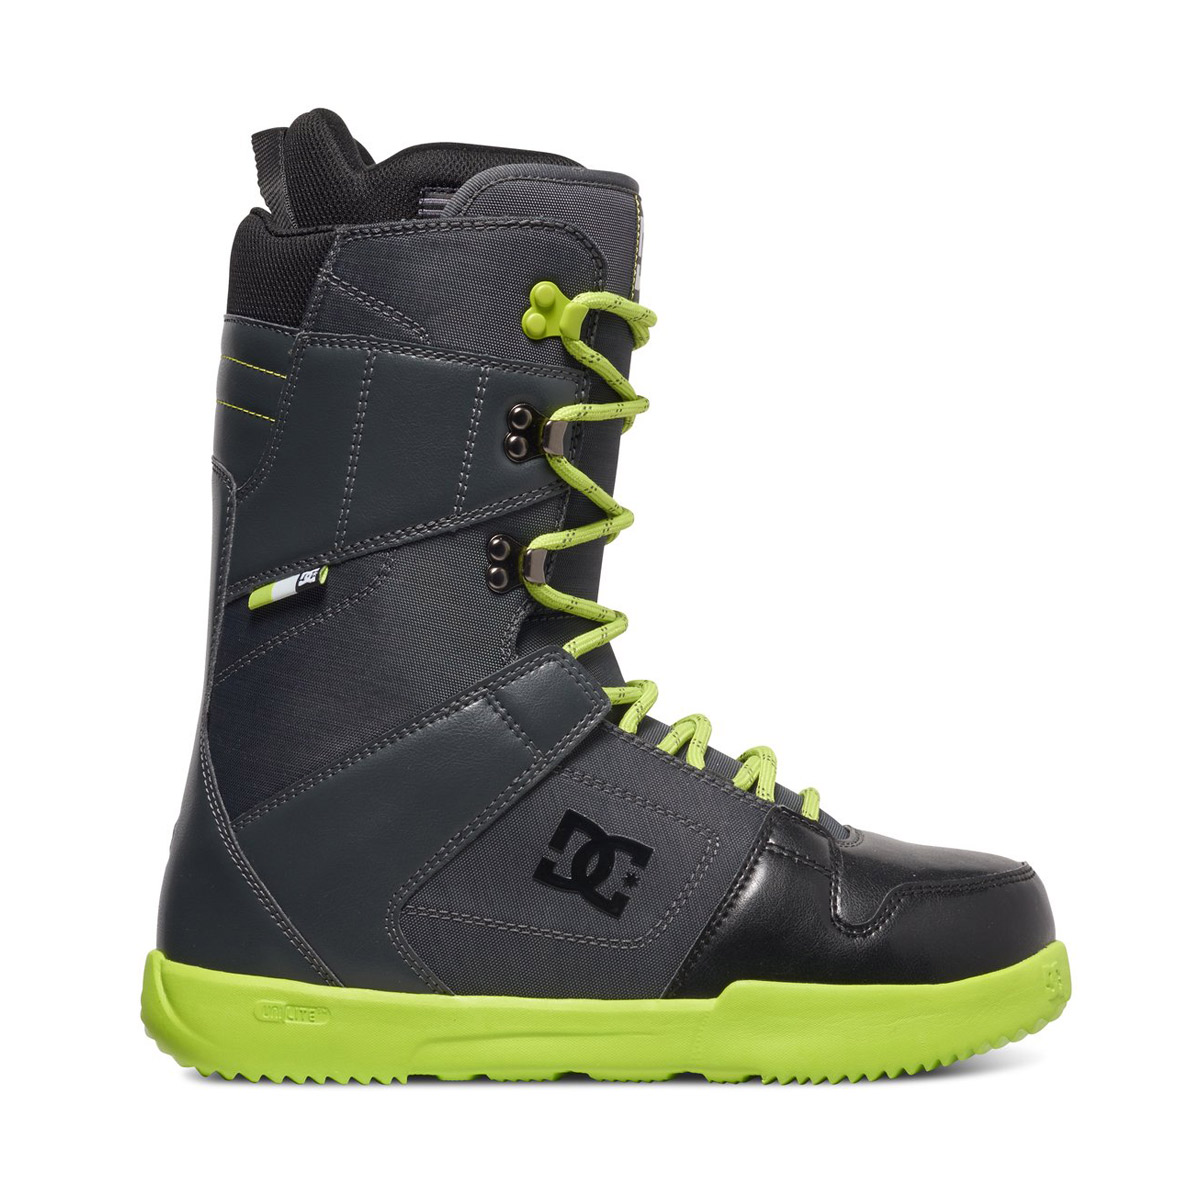 Ботинки для сноуборда DC Phase M LSBT Dark Shadow/Black/Lime 2017